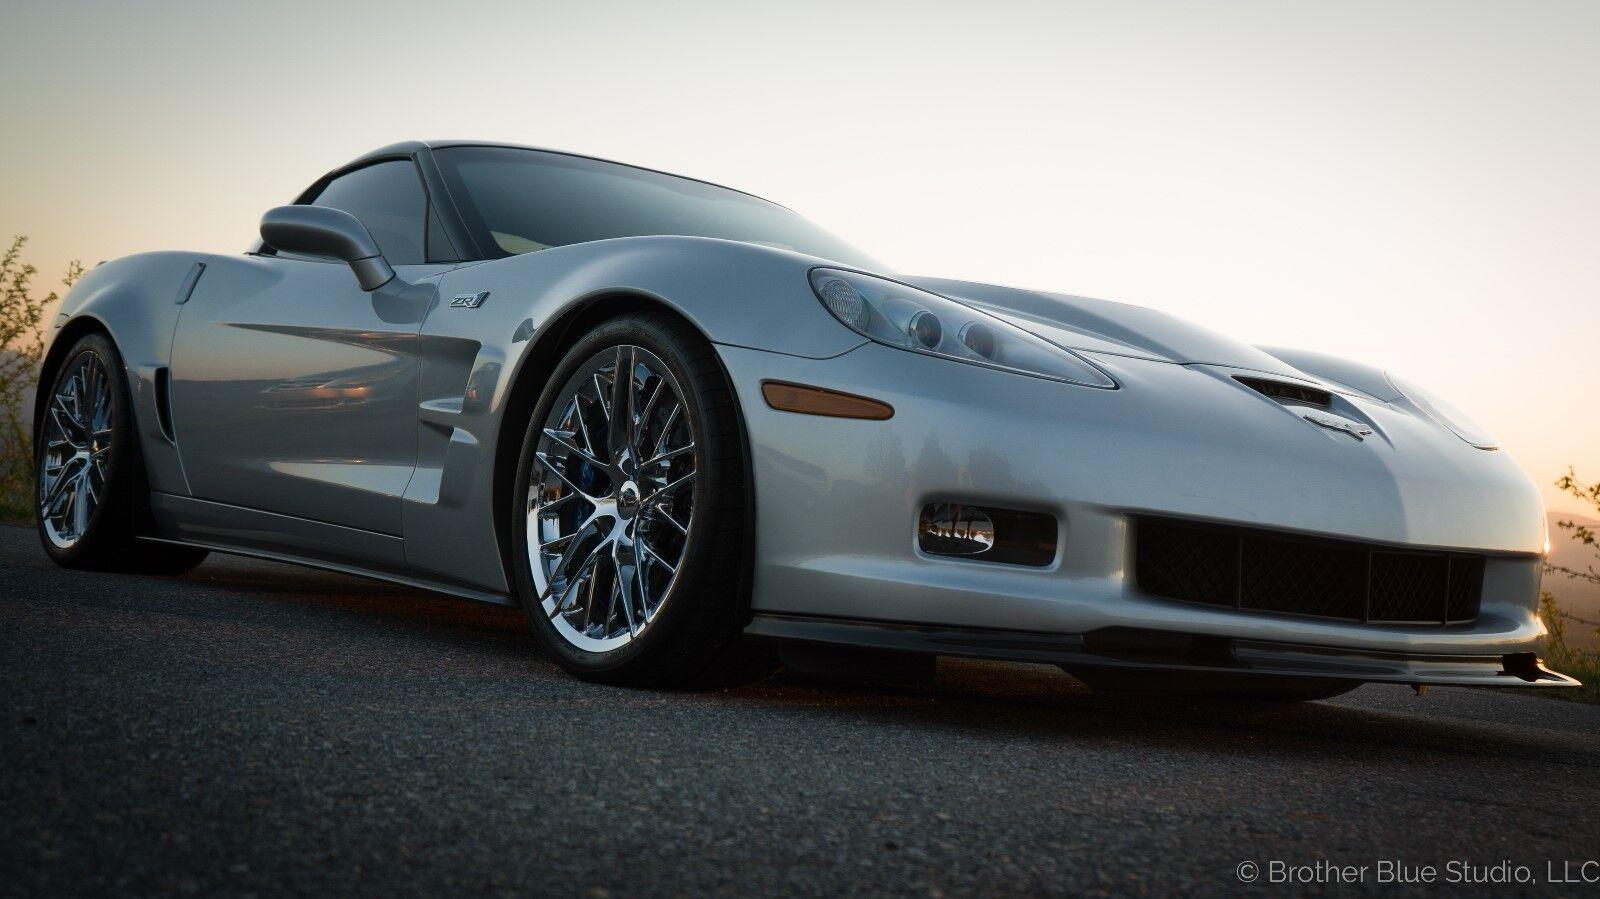 2010 Silver Chevrolet Corvette     C6 Corvette Photo 1